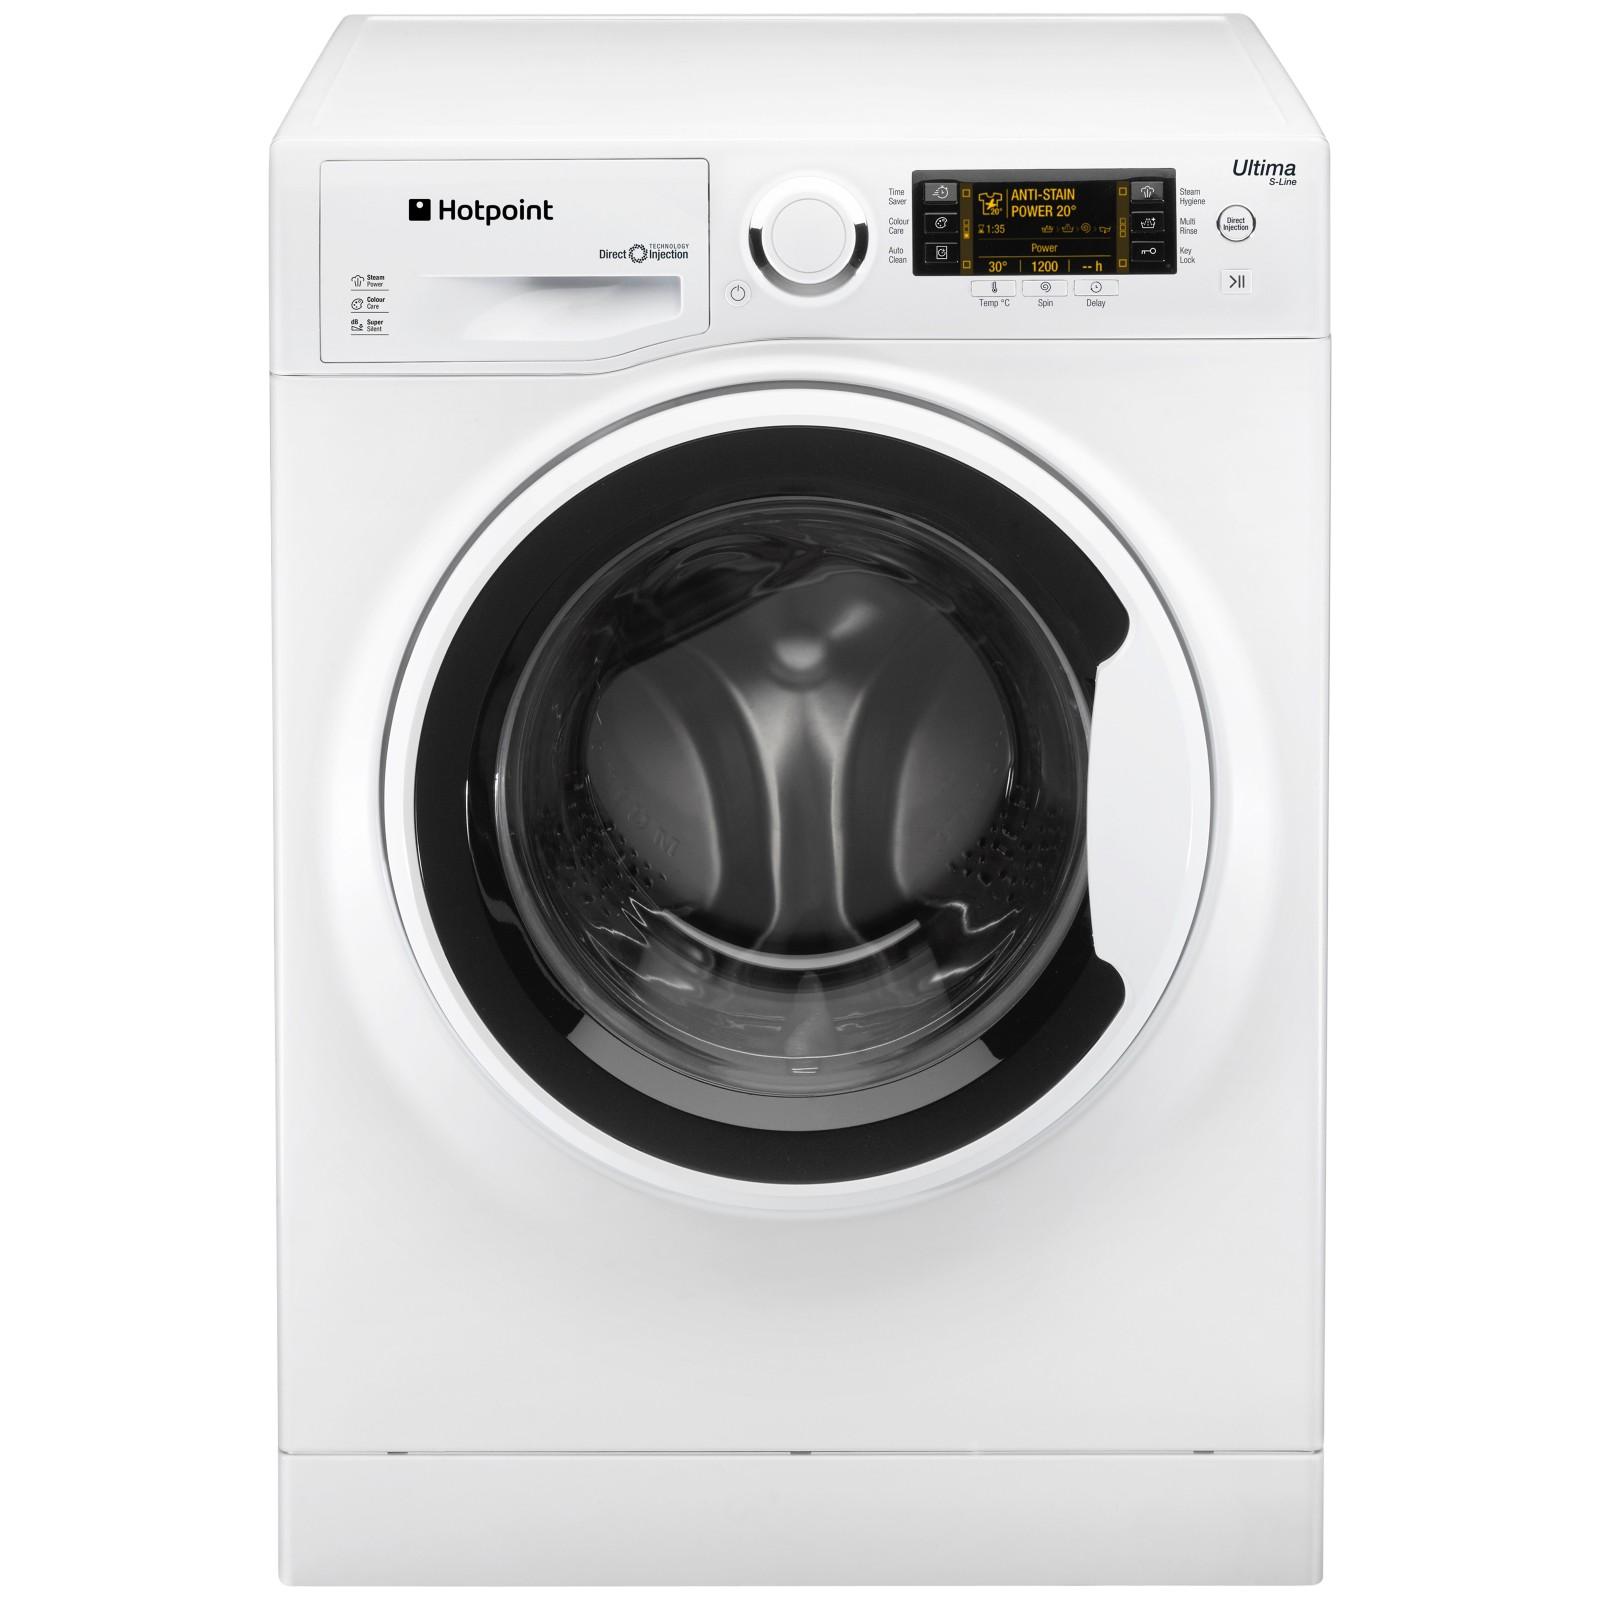 Hotpoint RPD10457J Ultima S-Line Freestanding Washing Machine